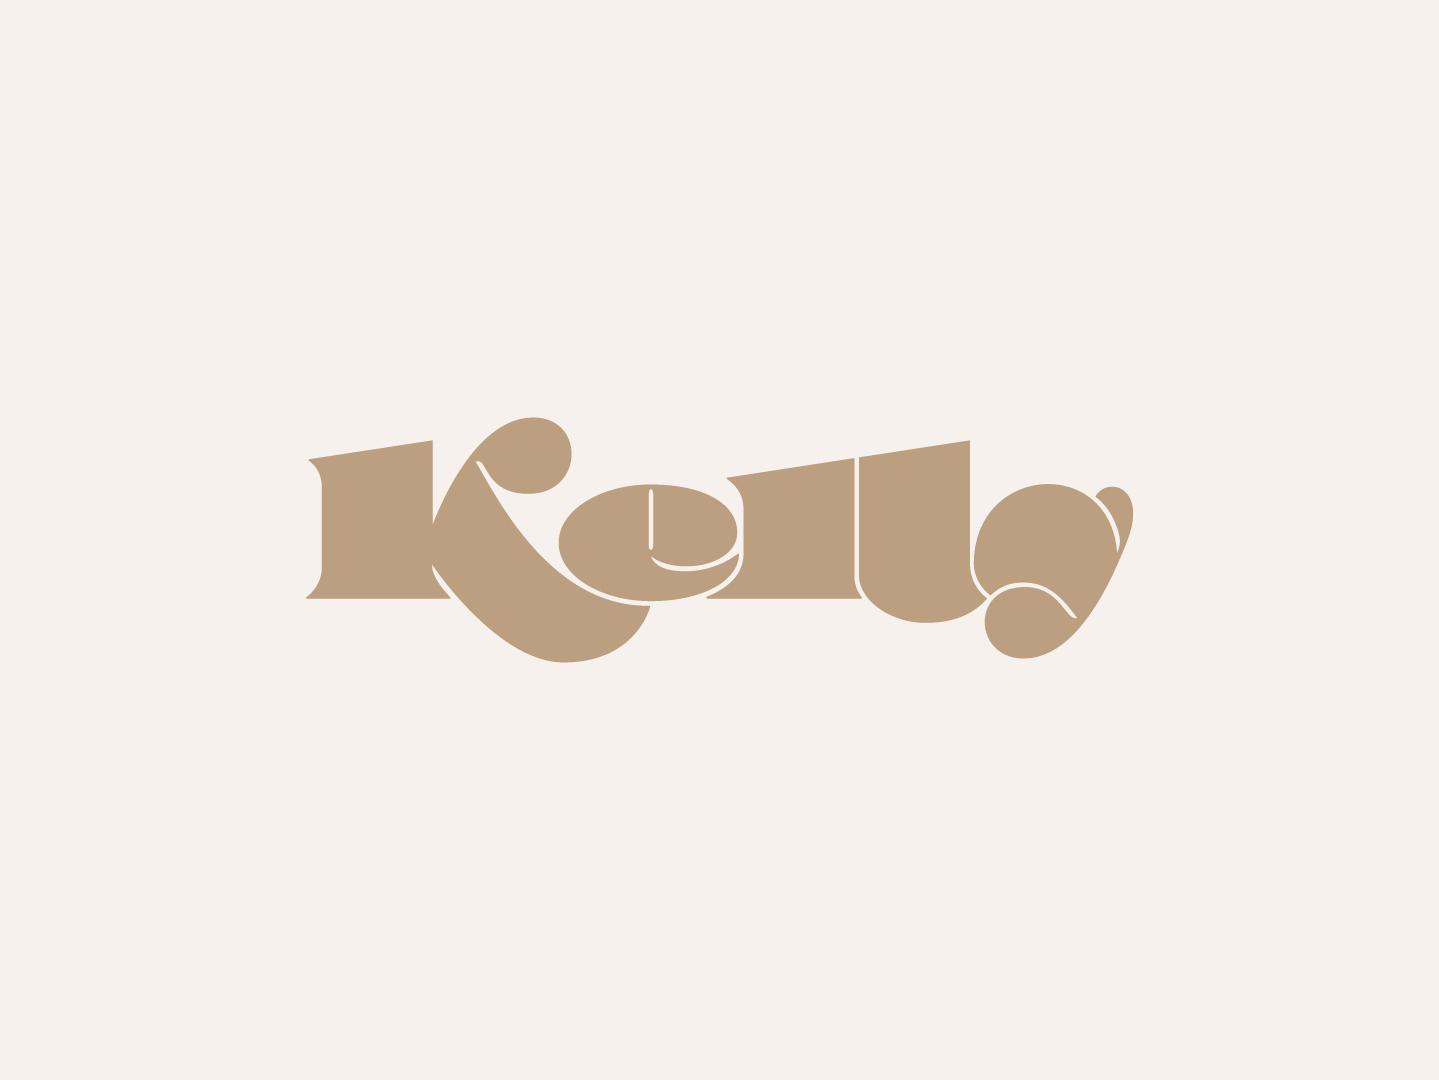 Kelly type branding identity wordmark illustration handlettering lettering typography logo